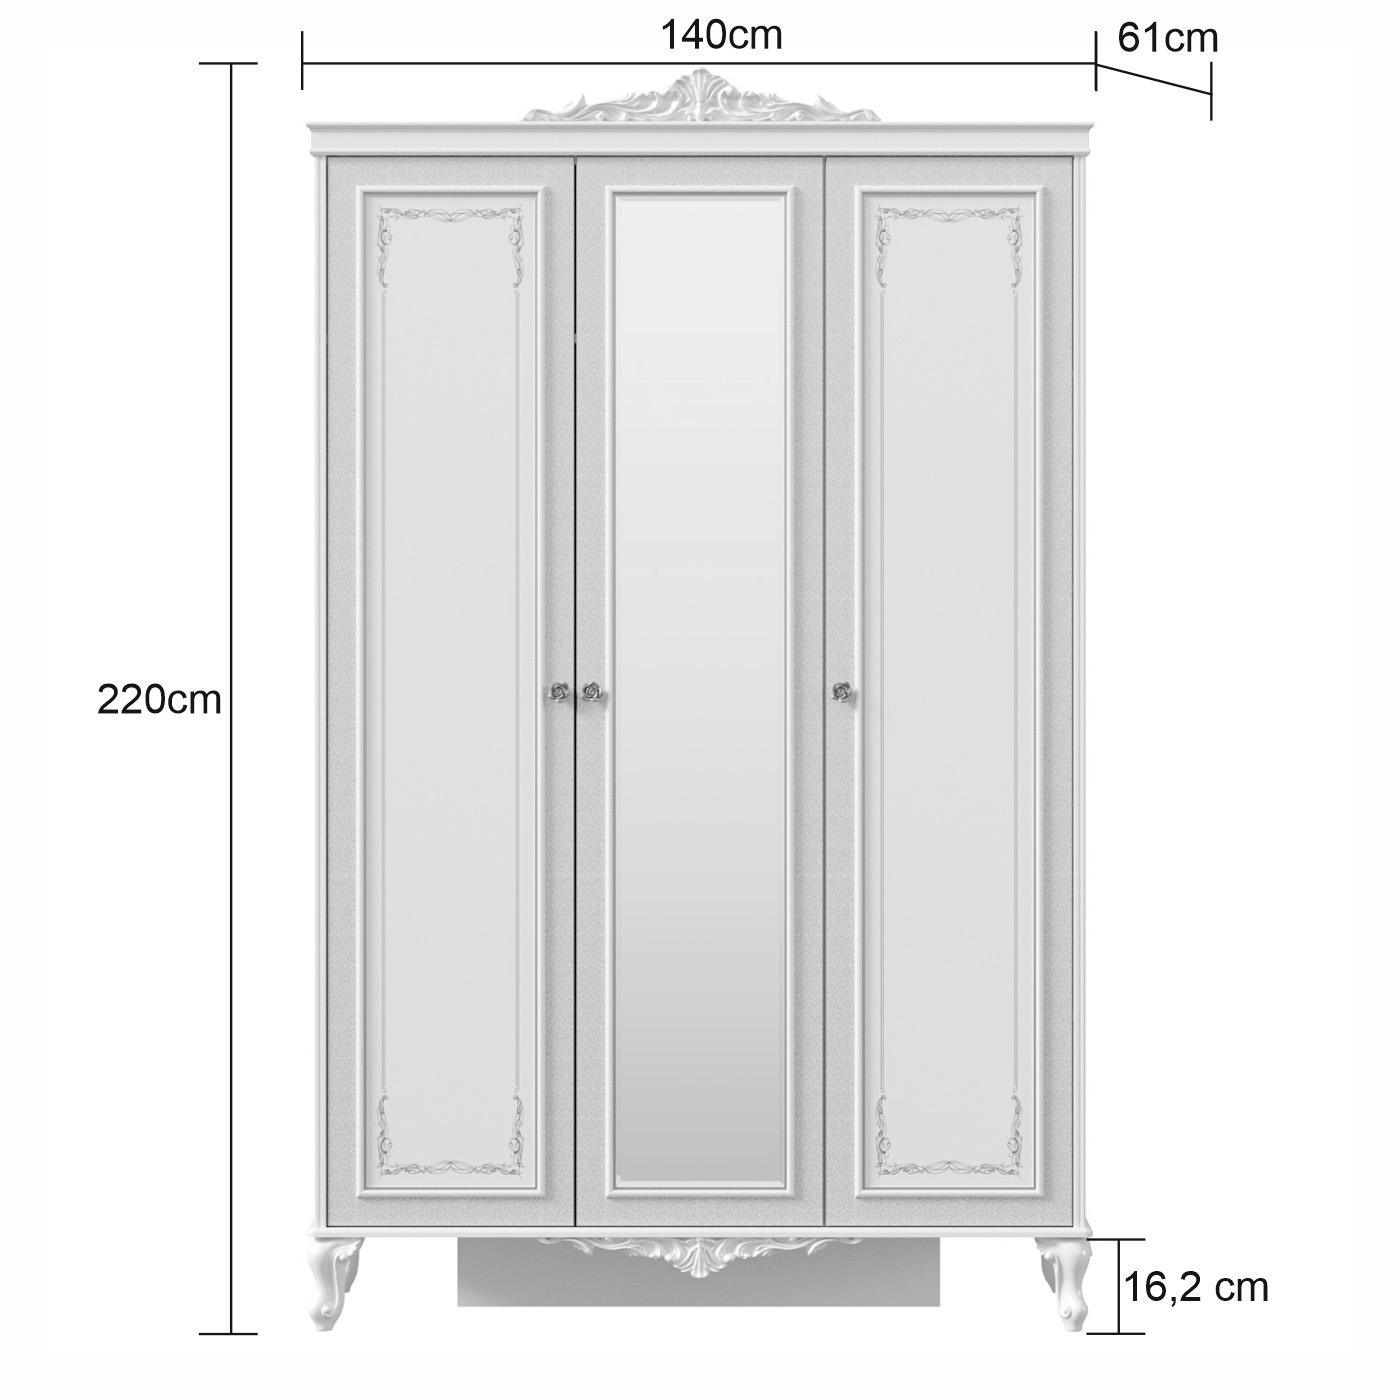 Barock Kleiderschrank Marquisa 3-Türig inklusive Spiegel